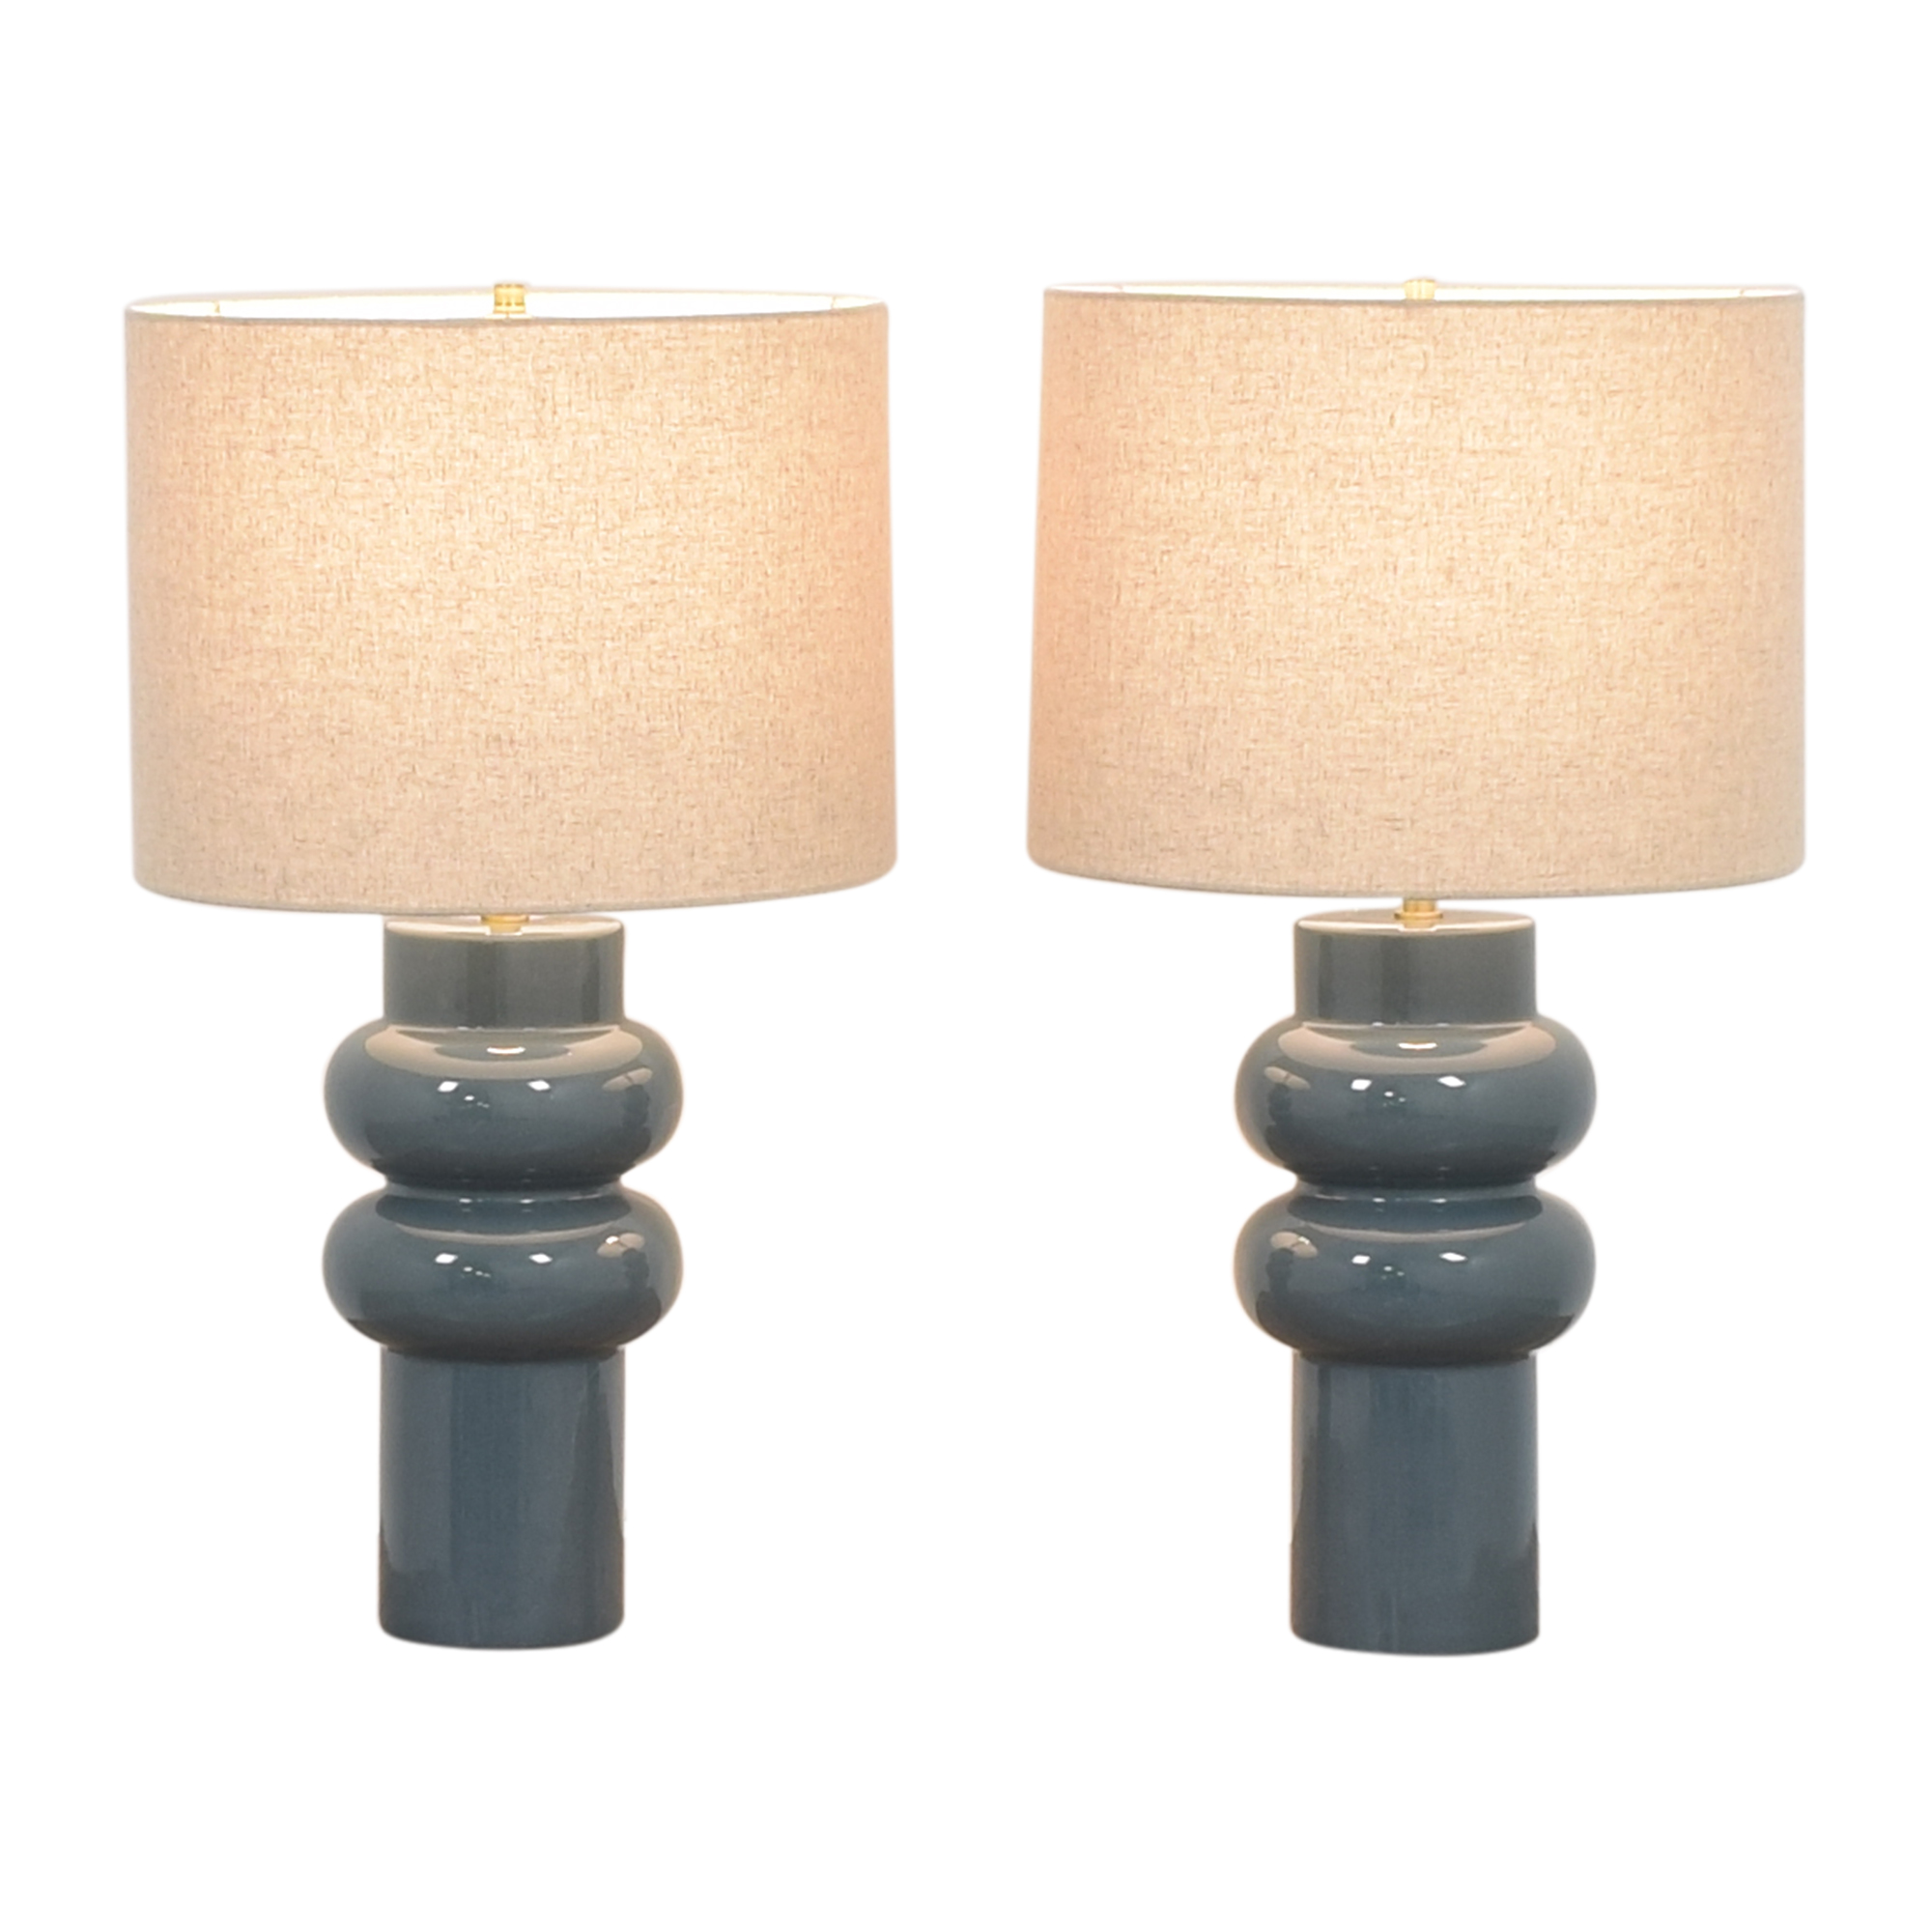 shop West Elm West Elm Modern Totem Table Lamps online